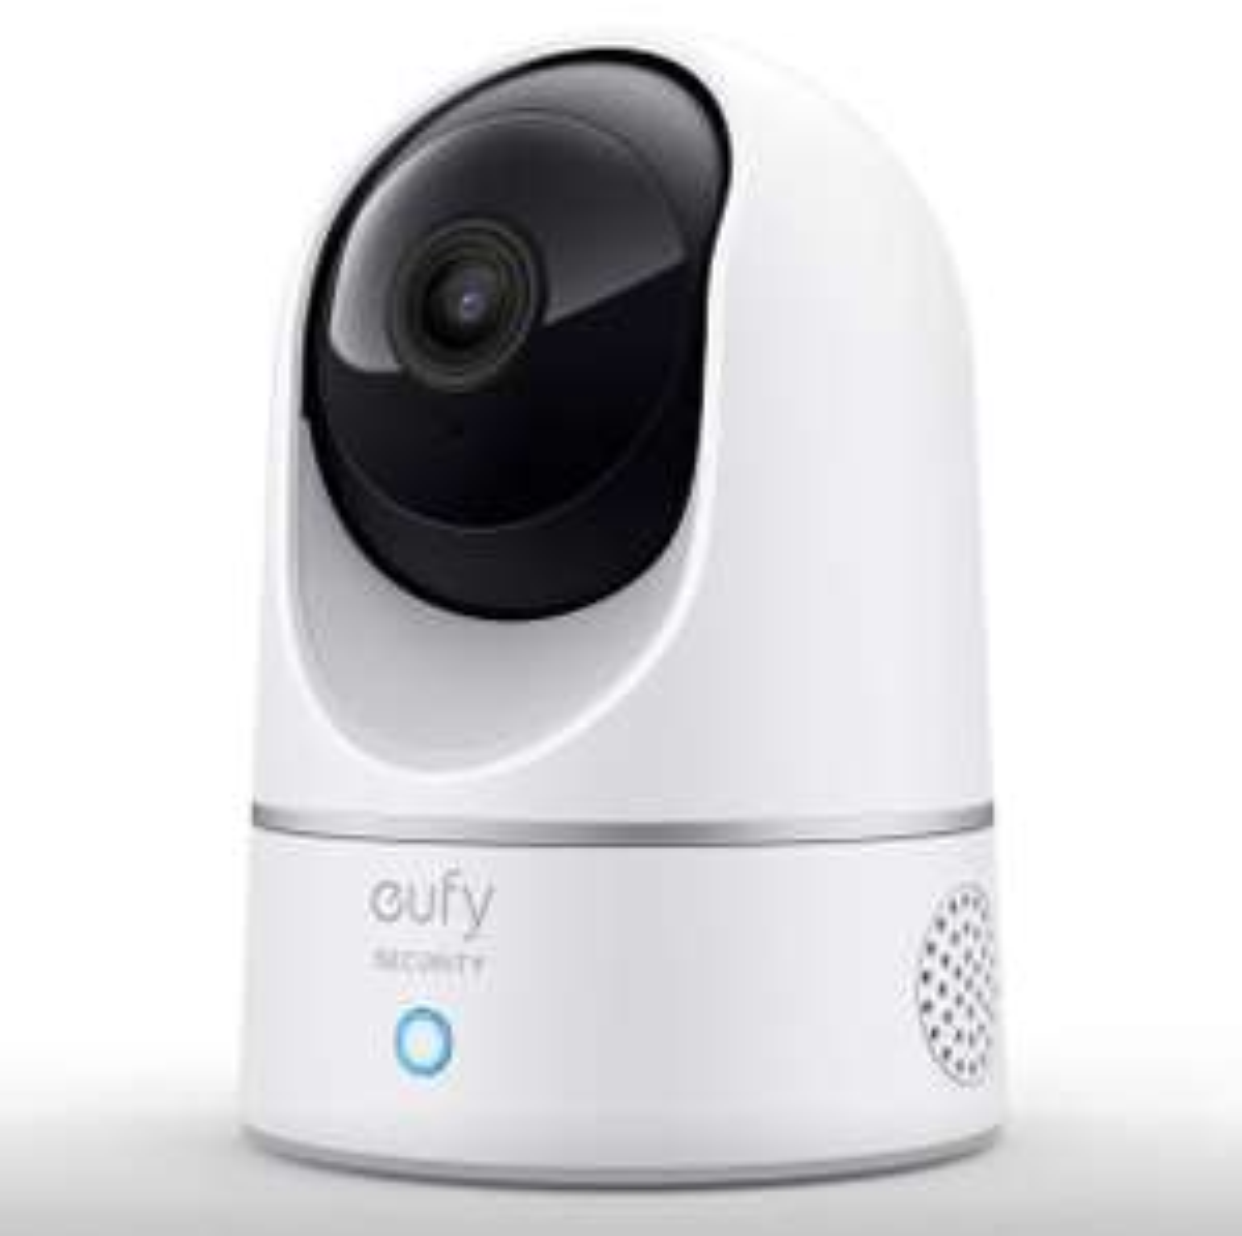 Caméra de surveillance intérieure Eufycam security 2K (Vendeur tiers)